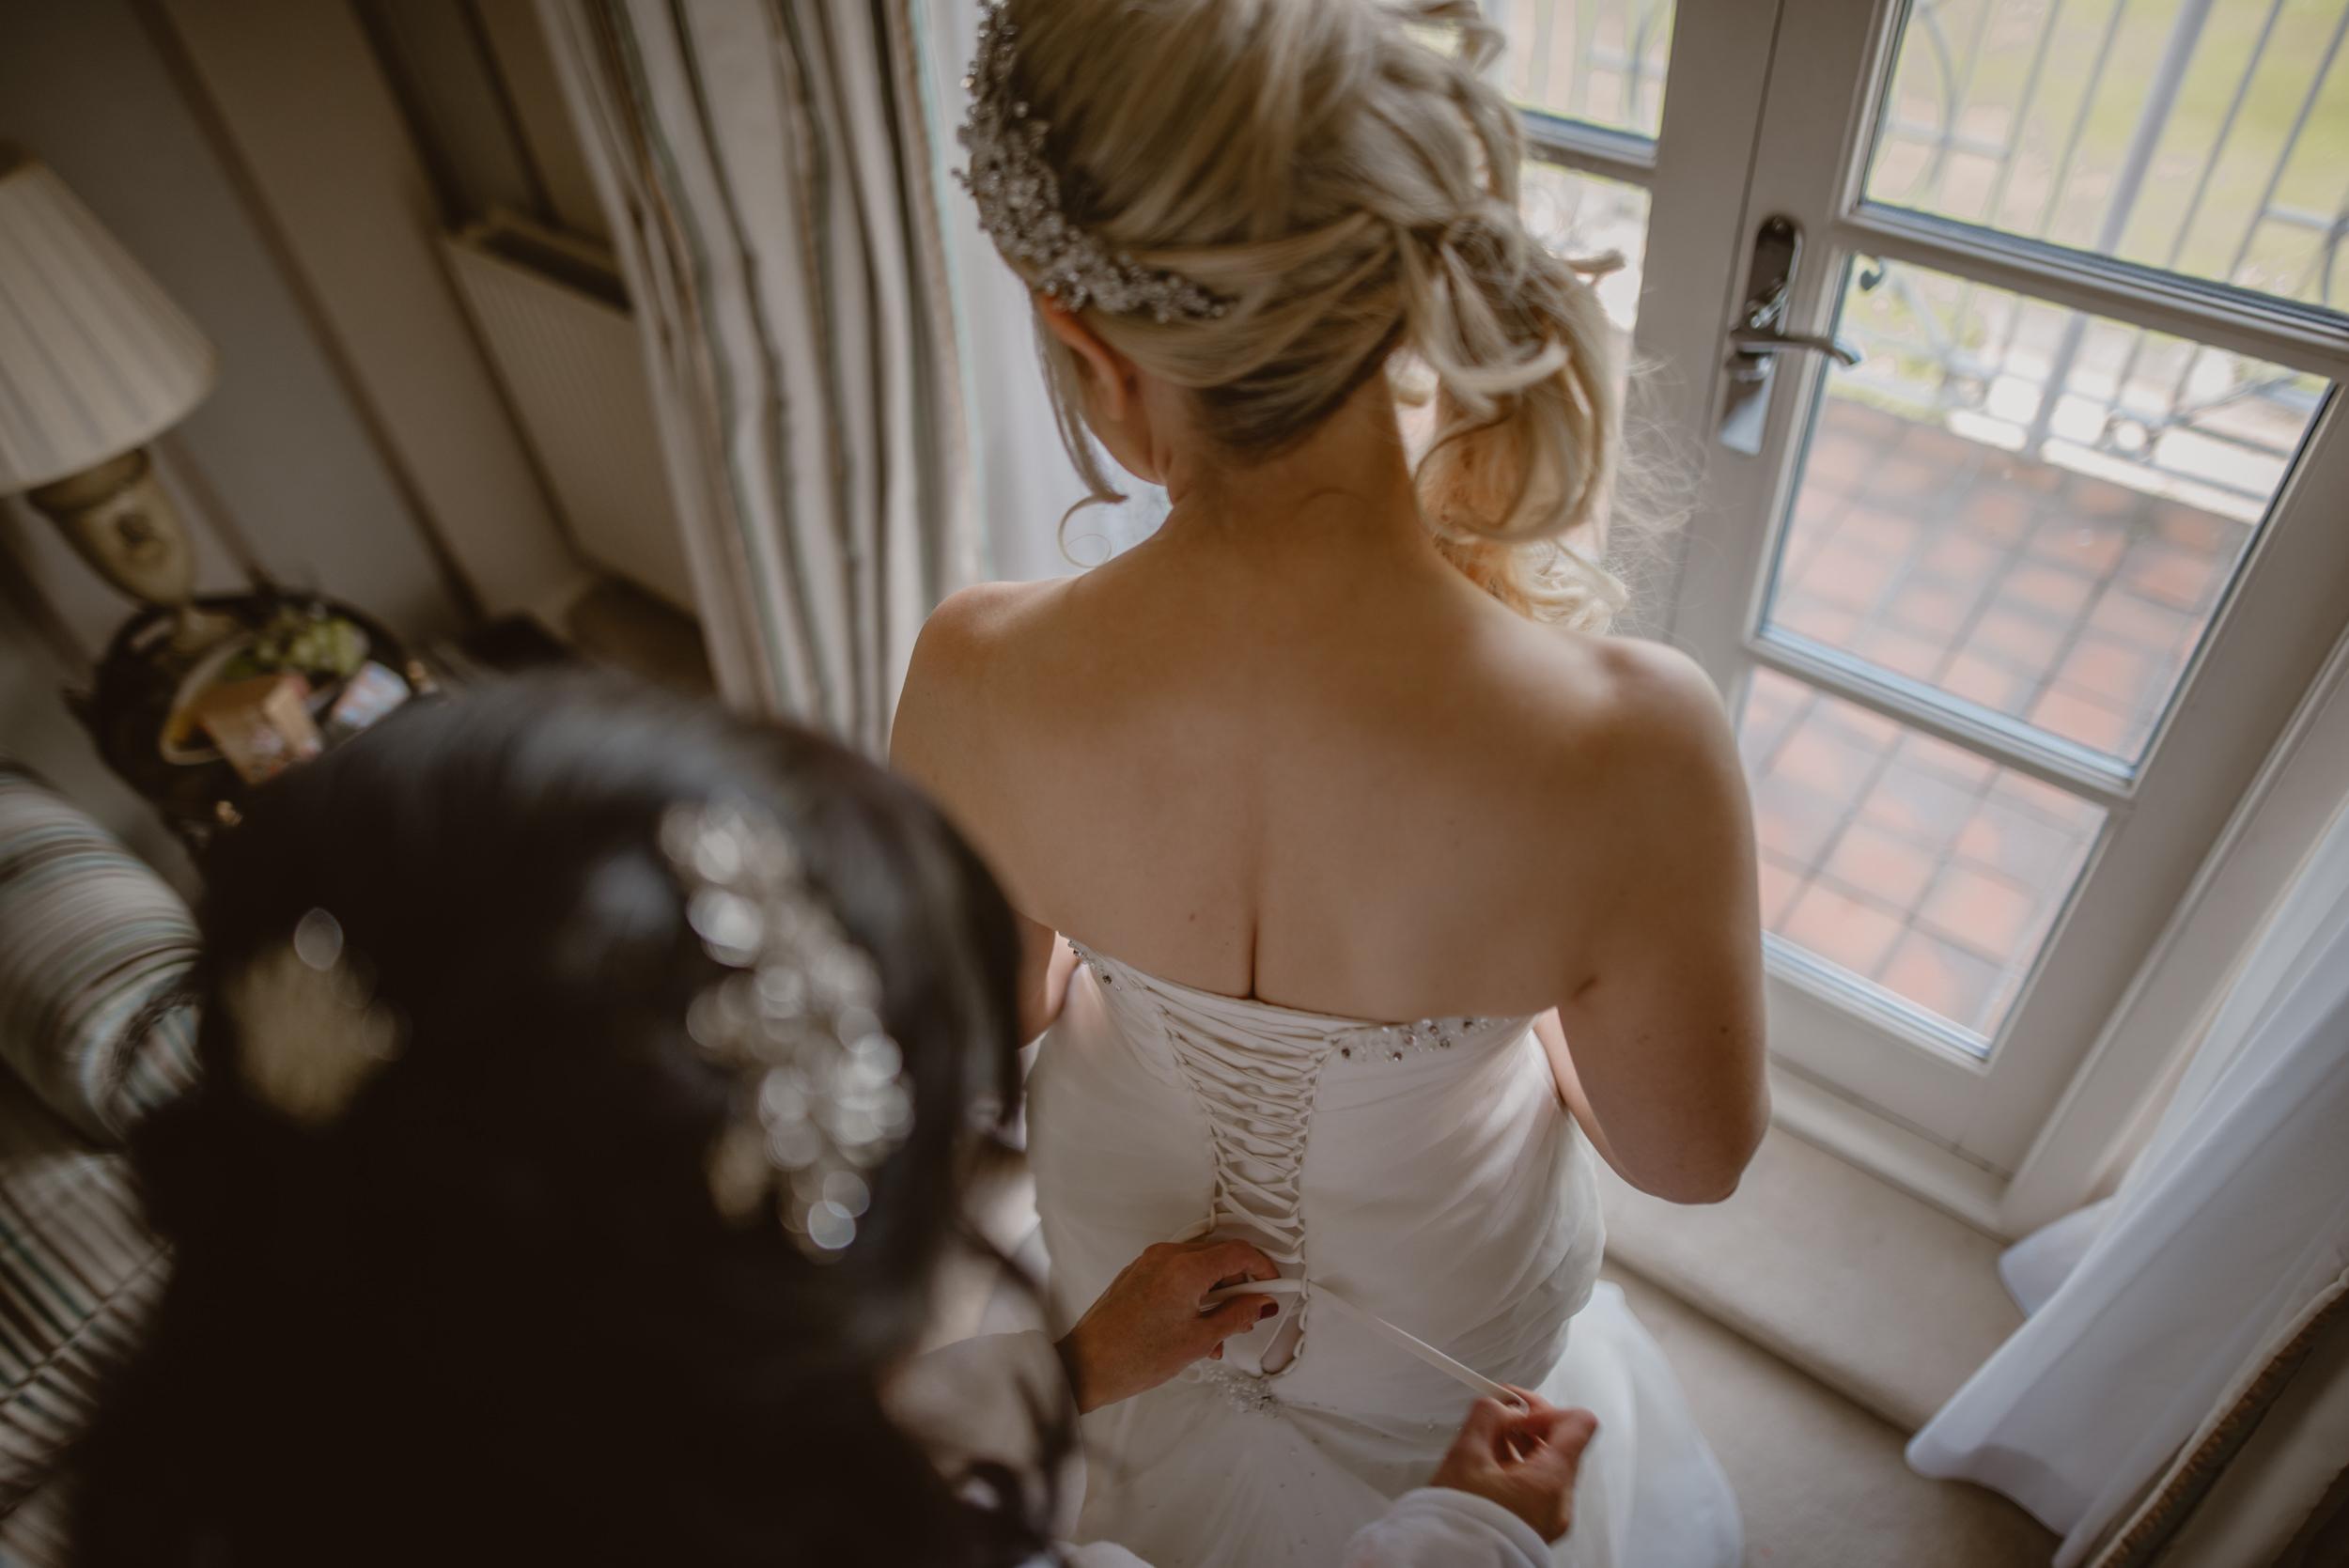 Trisha-and-Roger-wedding-The-Priory-Church-and-Chewton-Glen-Hotel-Christchurch-Manu-Mendoza-Wedding-Photography-052.jpg